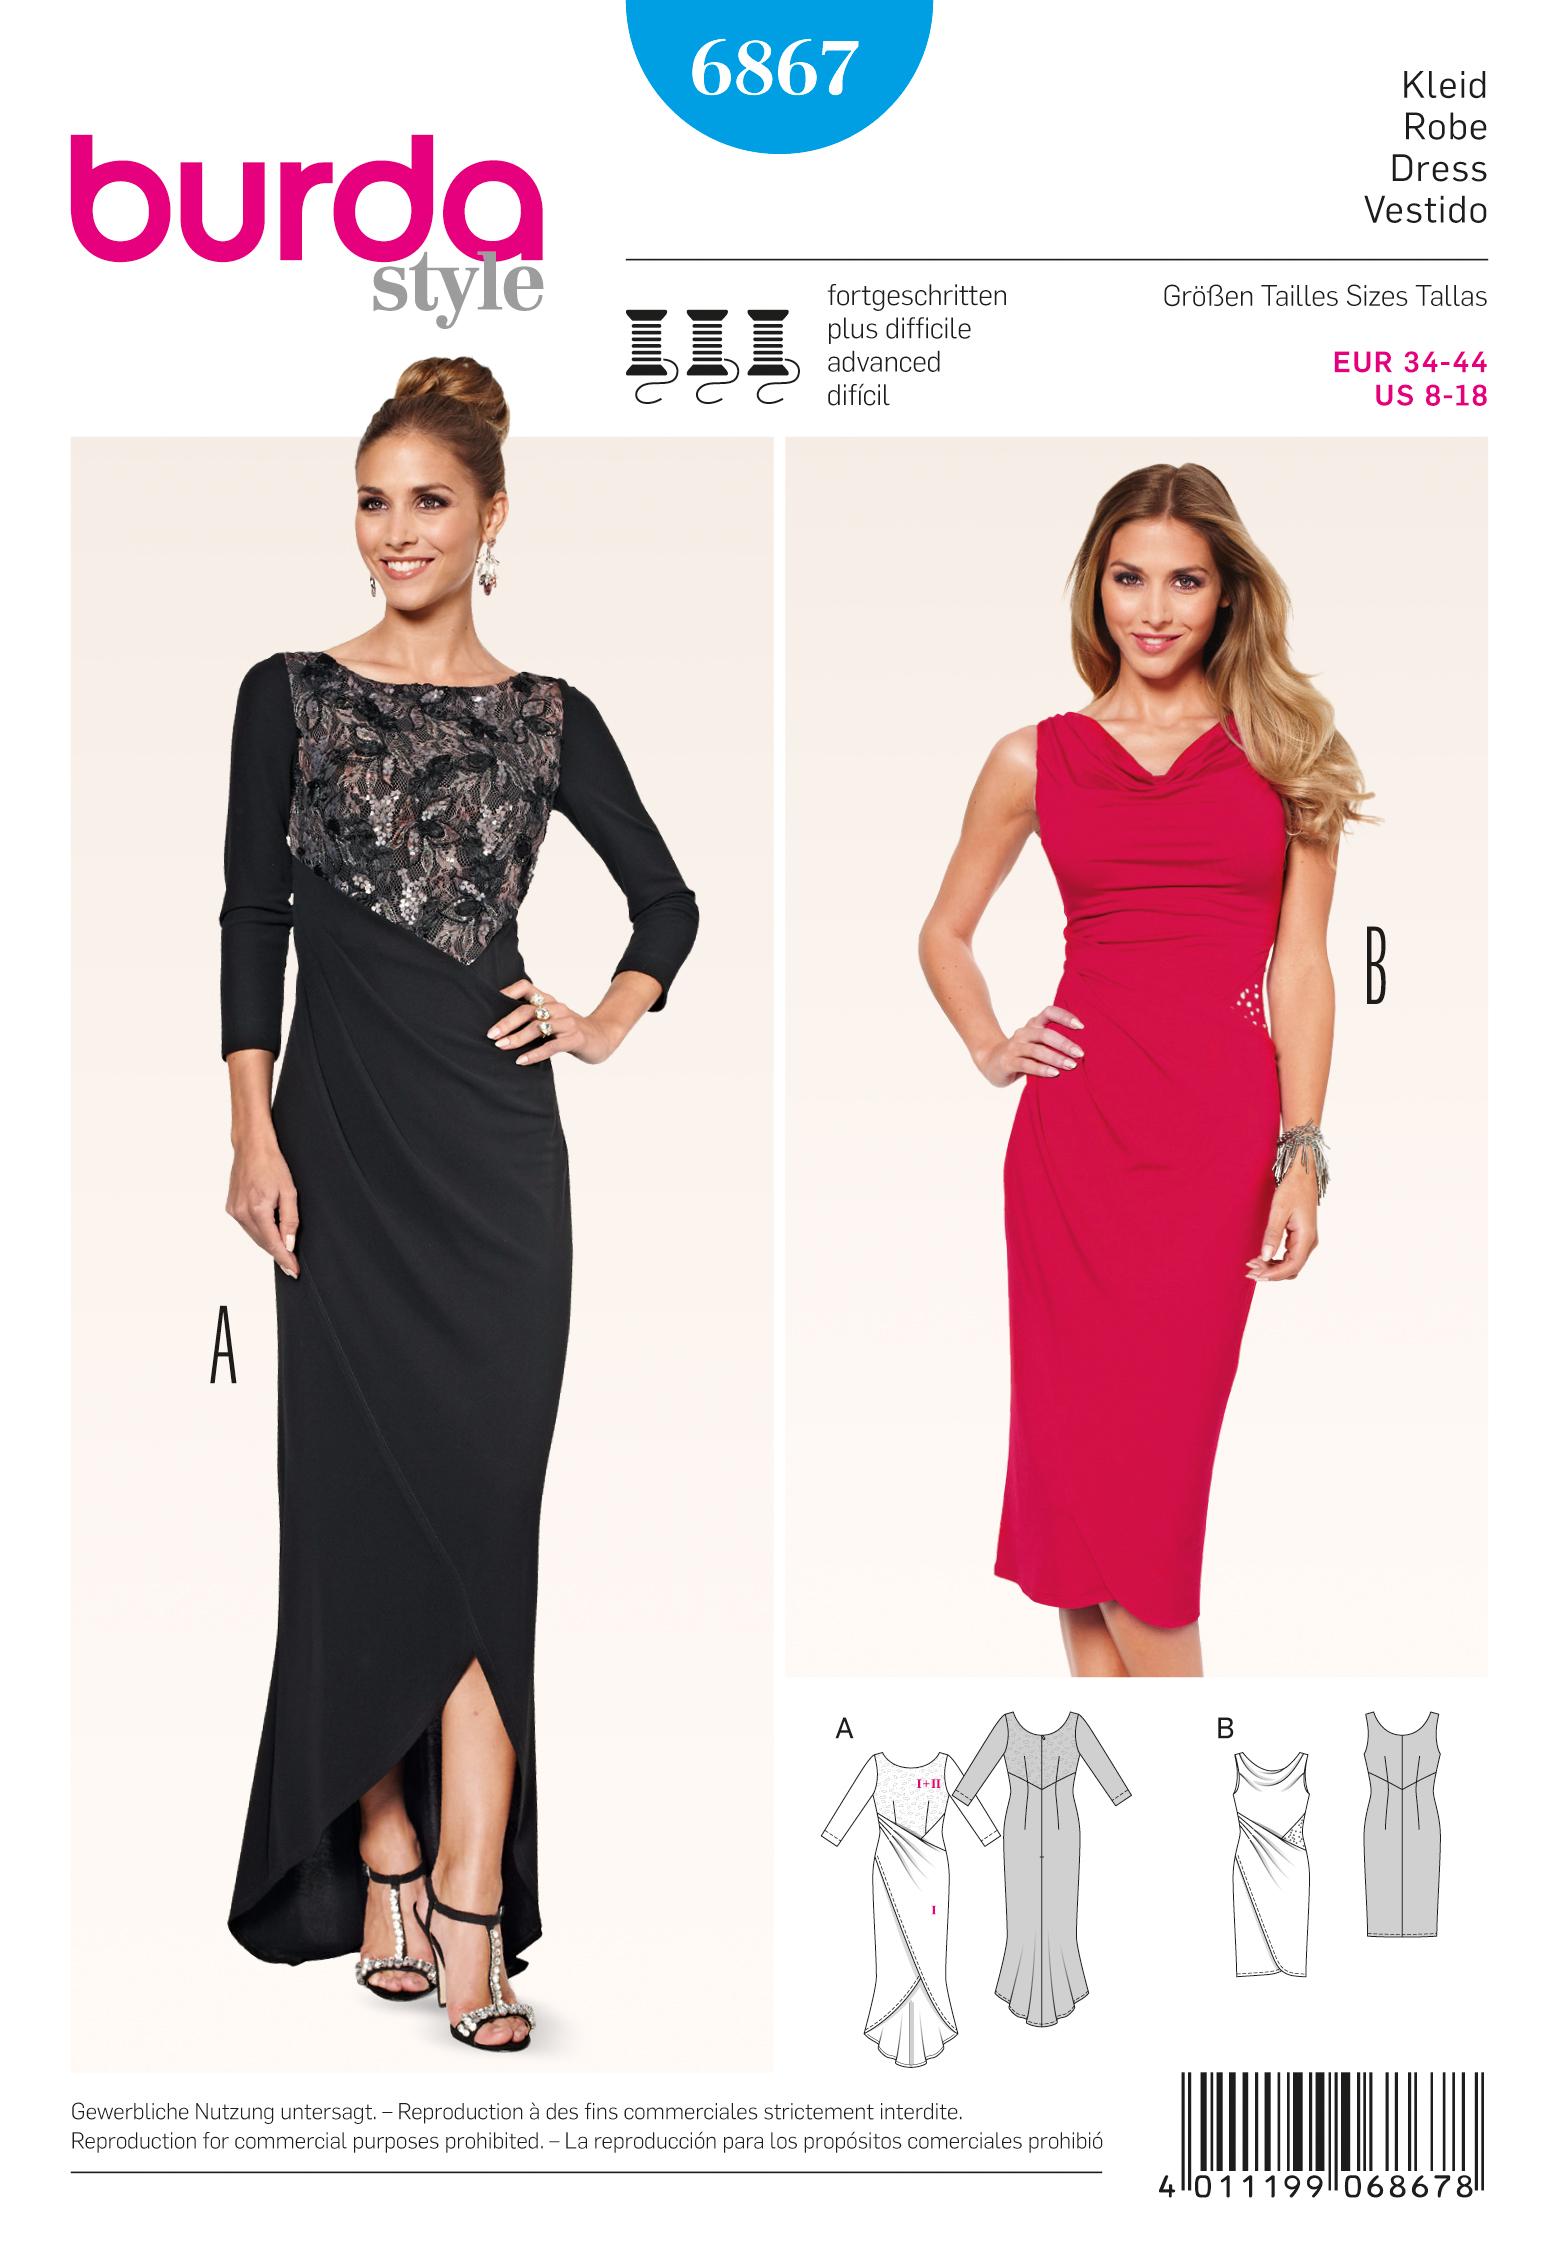 5c493ecb Burda Dress Patterns?start=50 for Sale UK   Buy Burda Dress Patterns ...